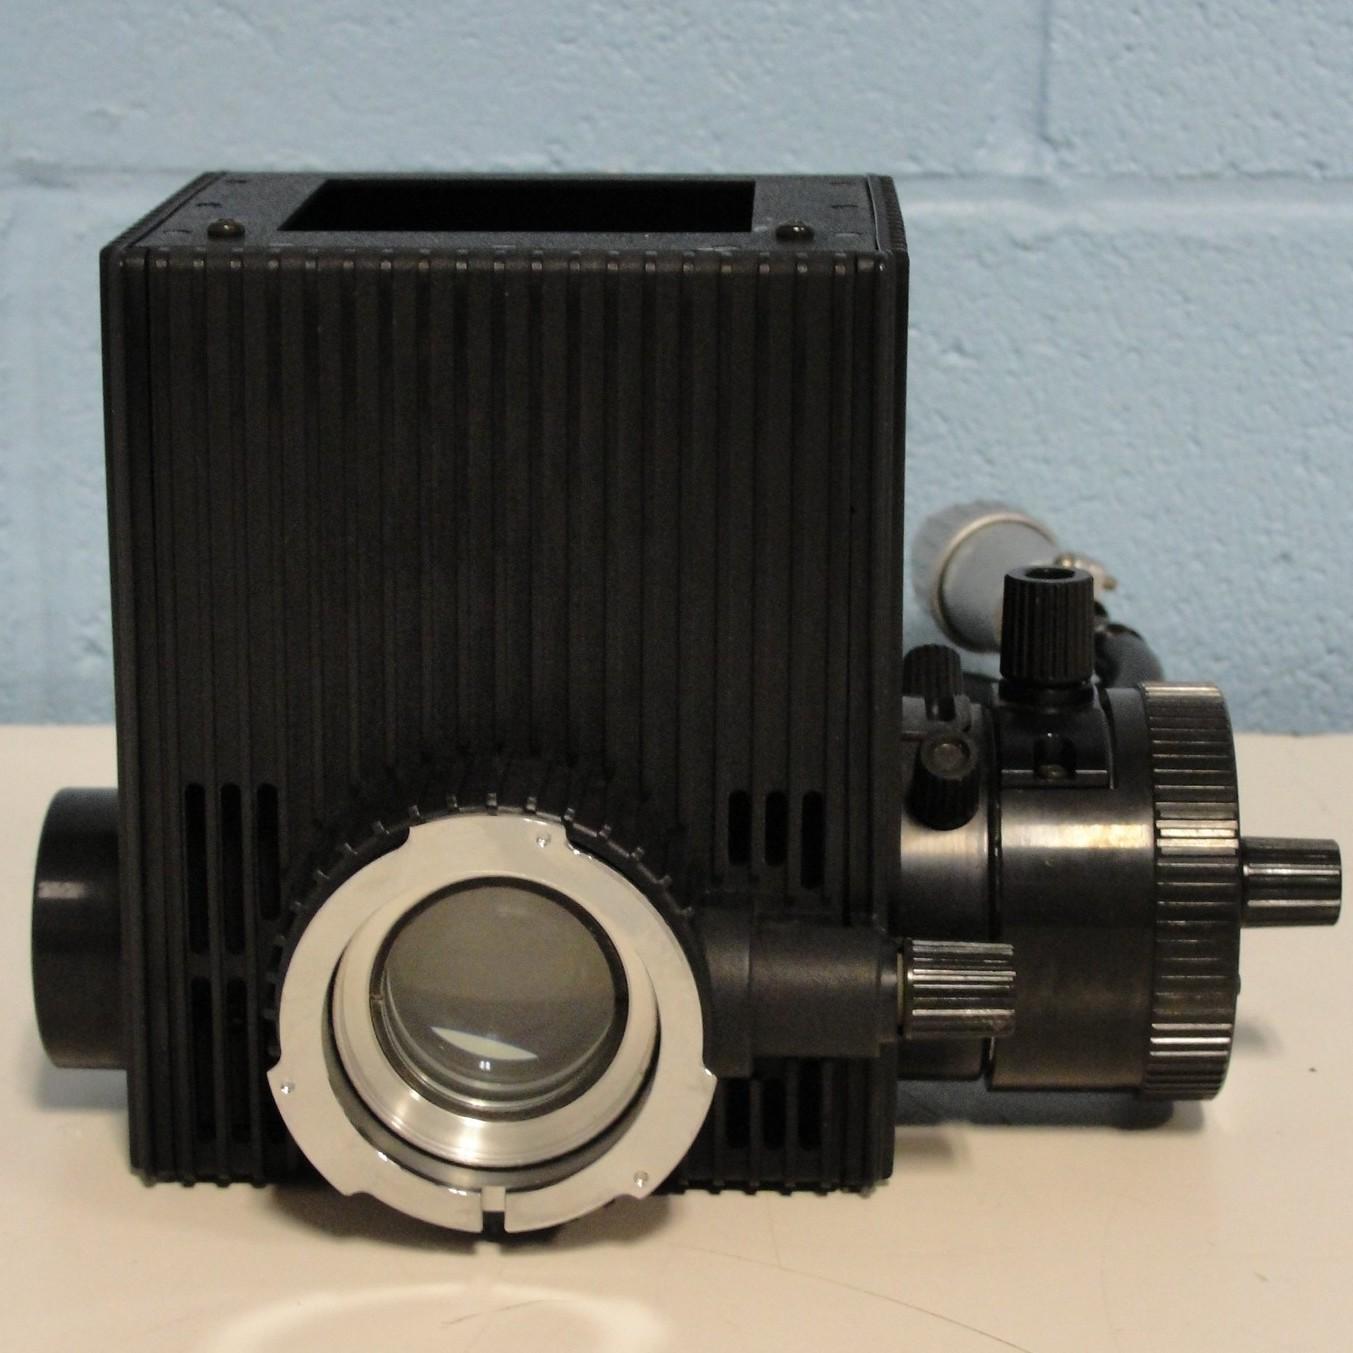 Nikon Hg 100W Lamp Housing Unit Image